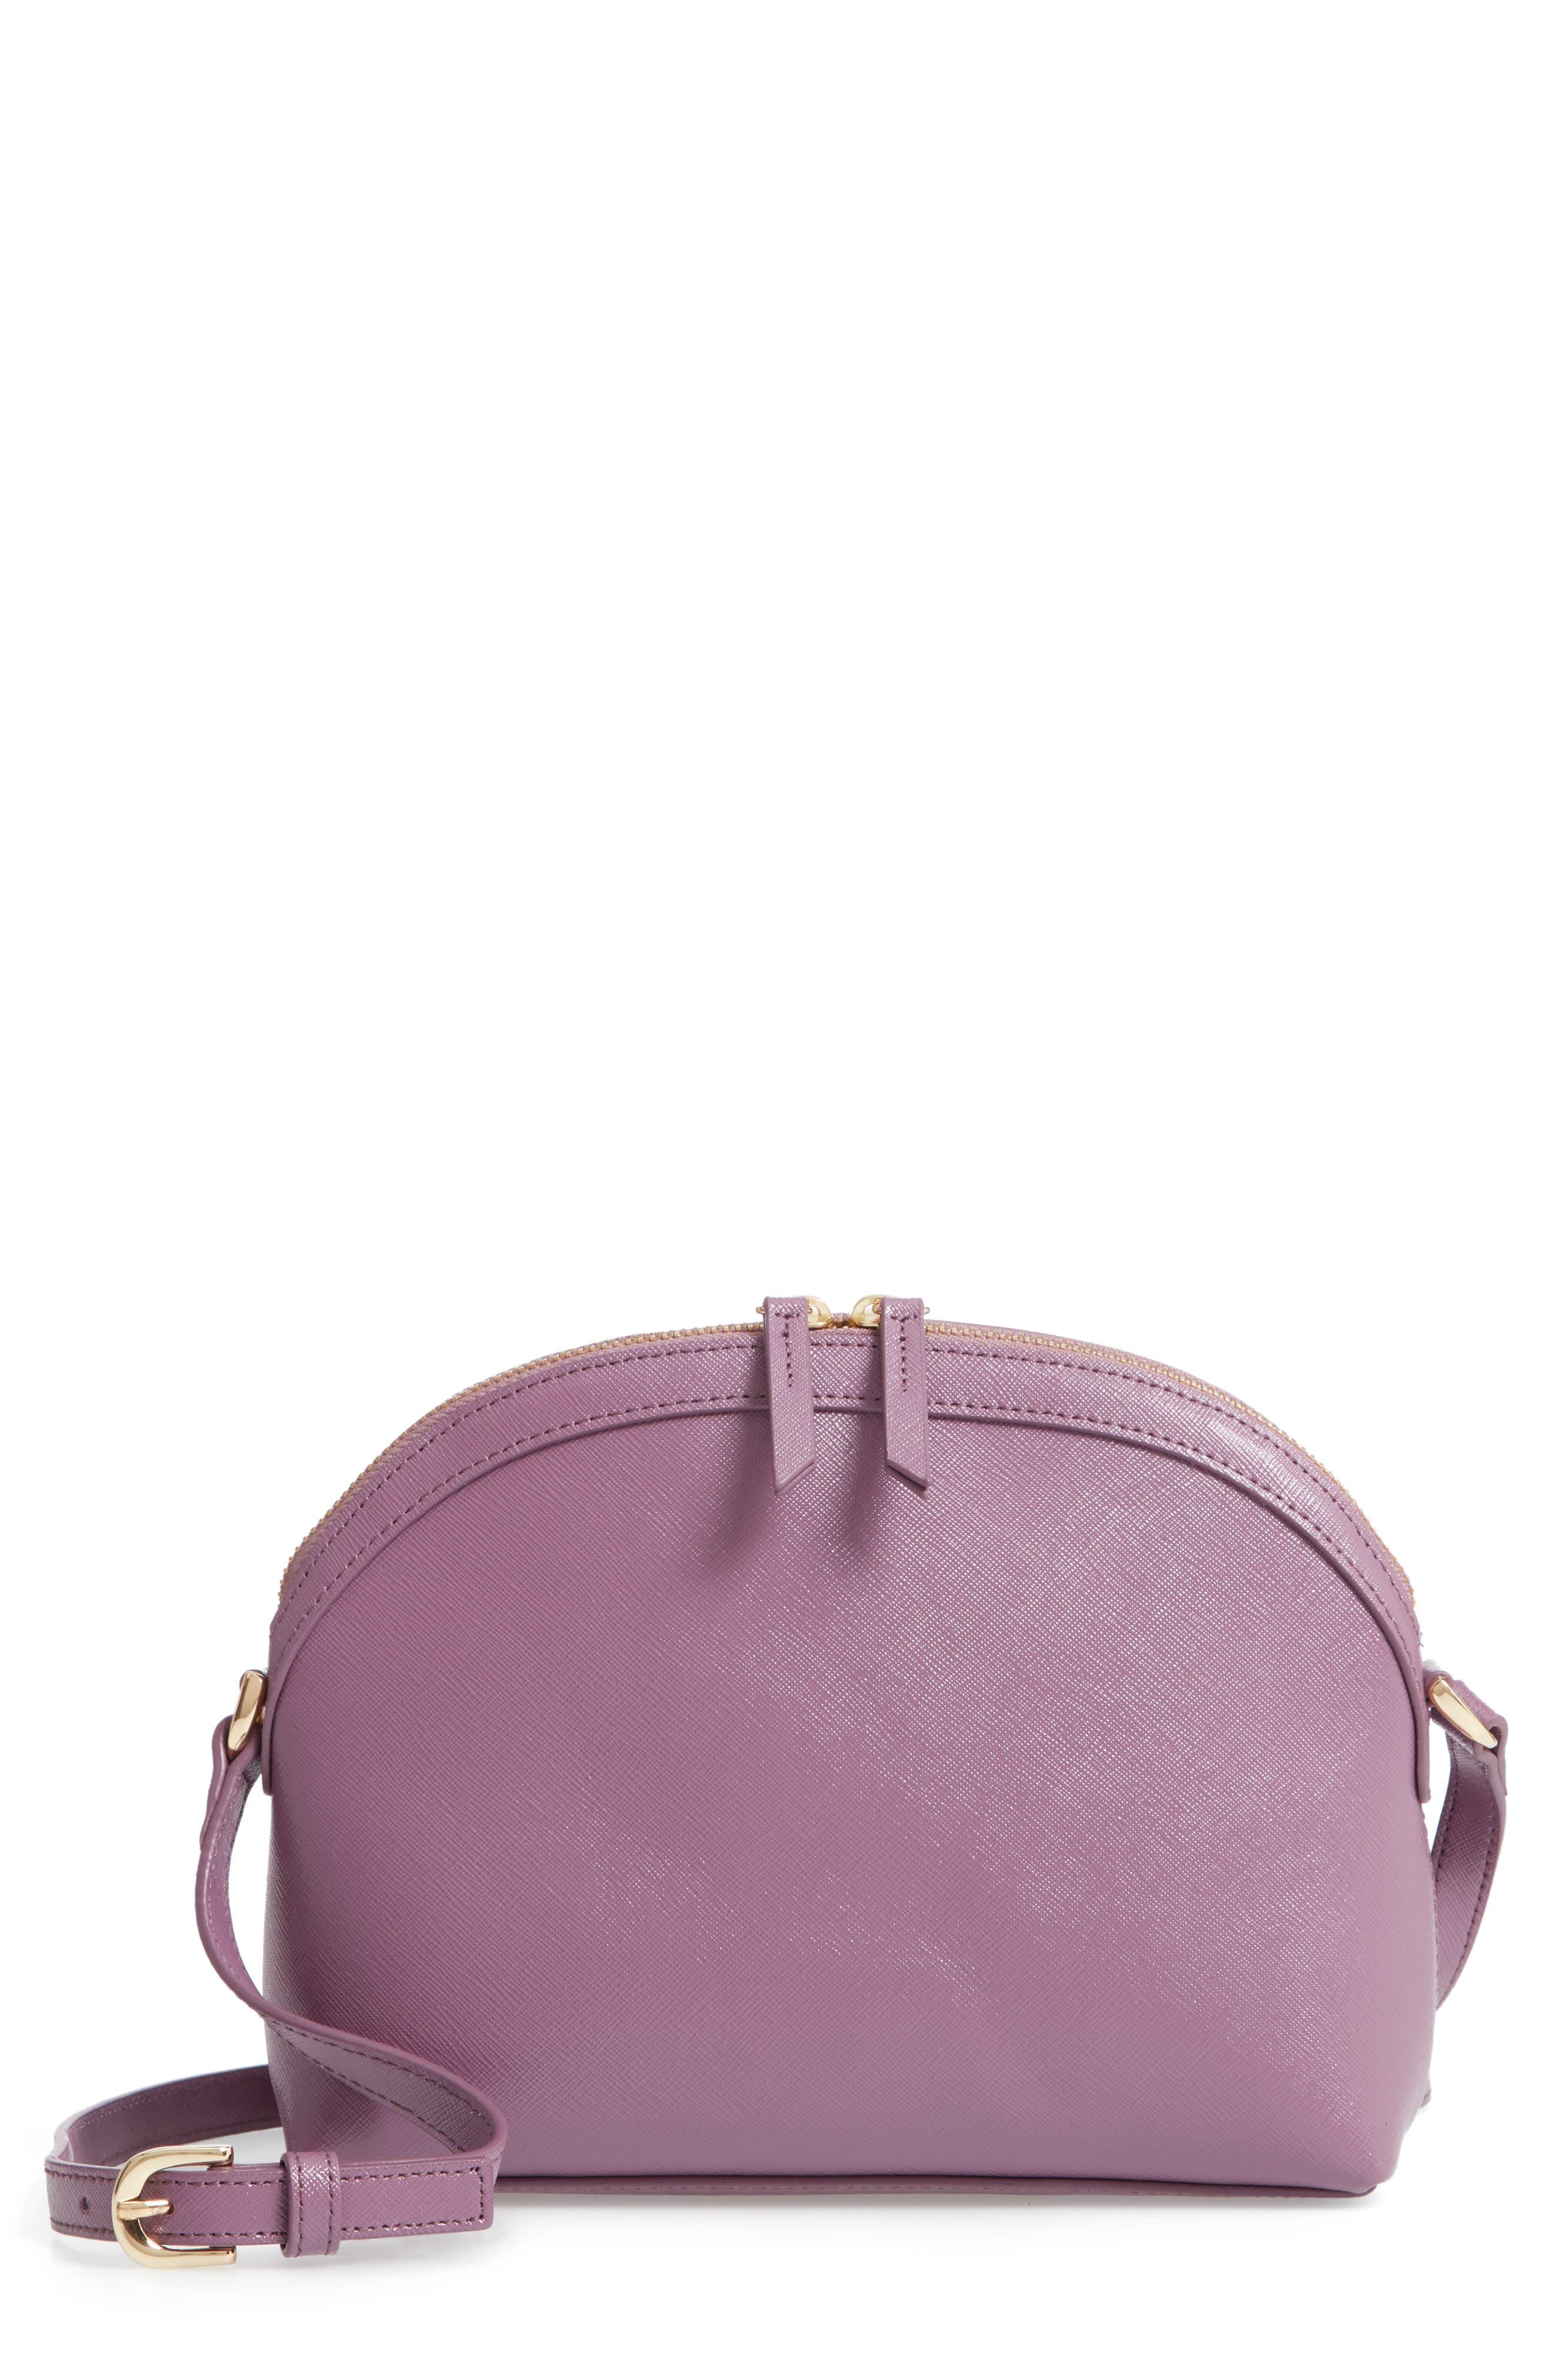 Isobel Half Moon Leather Crossbody Bag,                             Main thumbnail 1, color,                             PURPLE BETTA